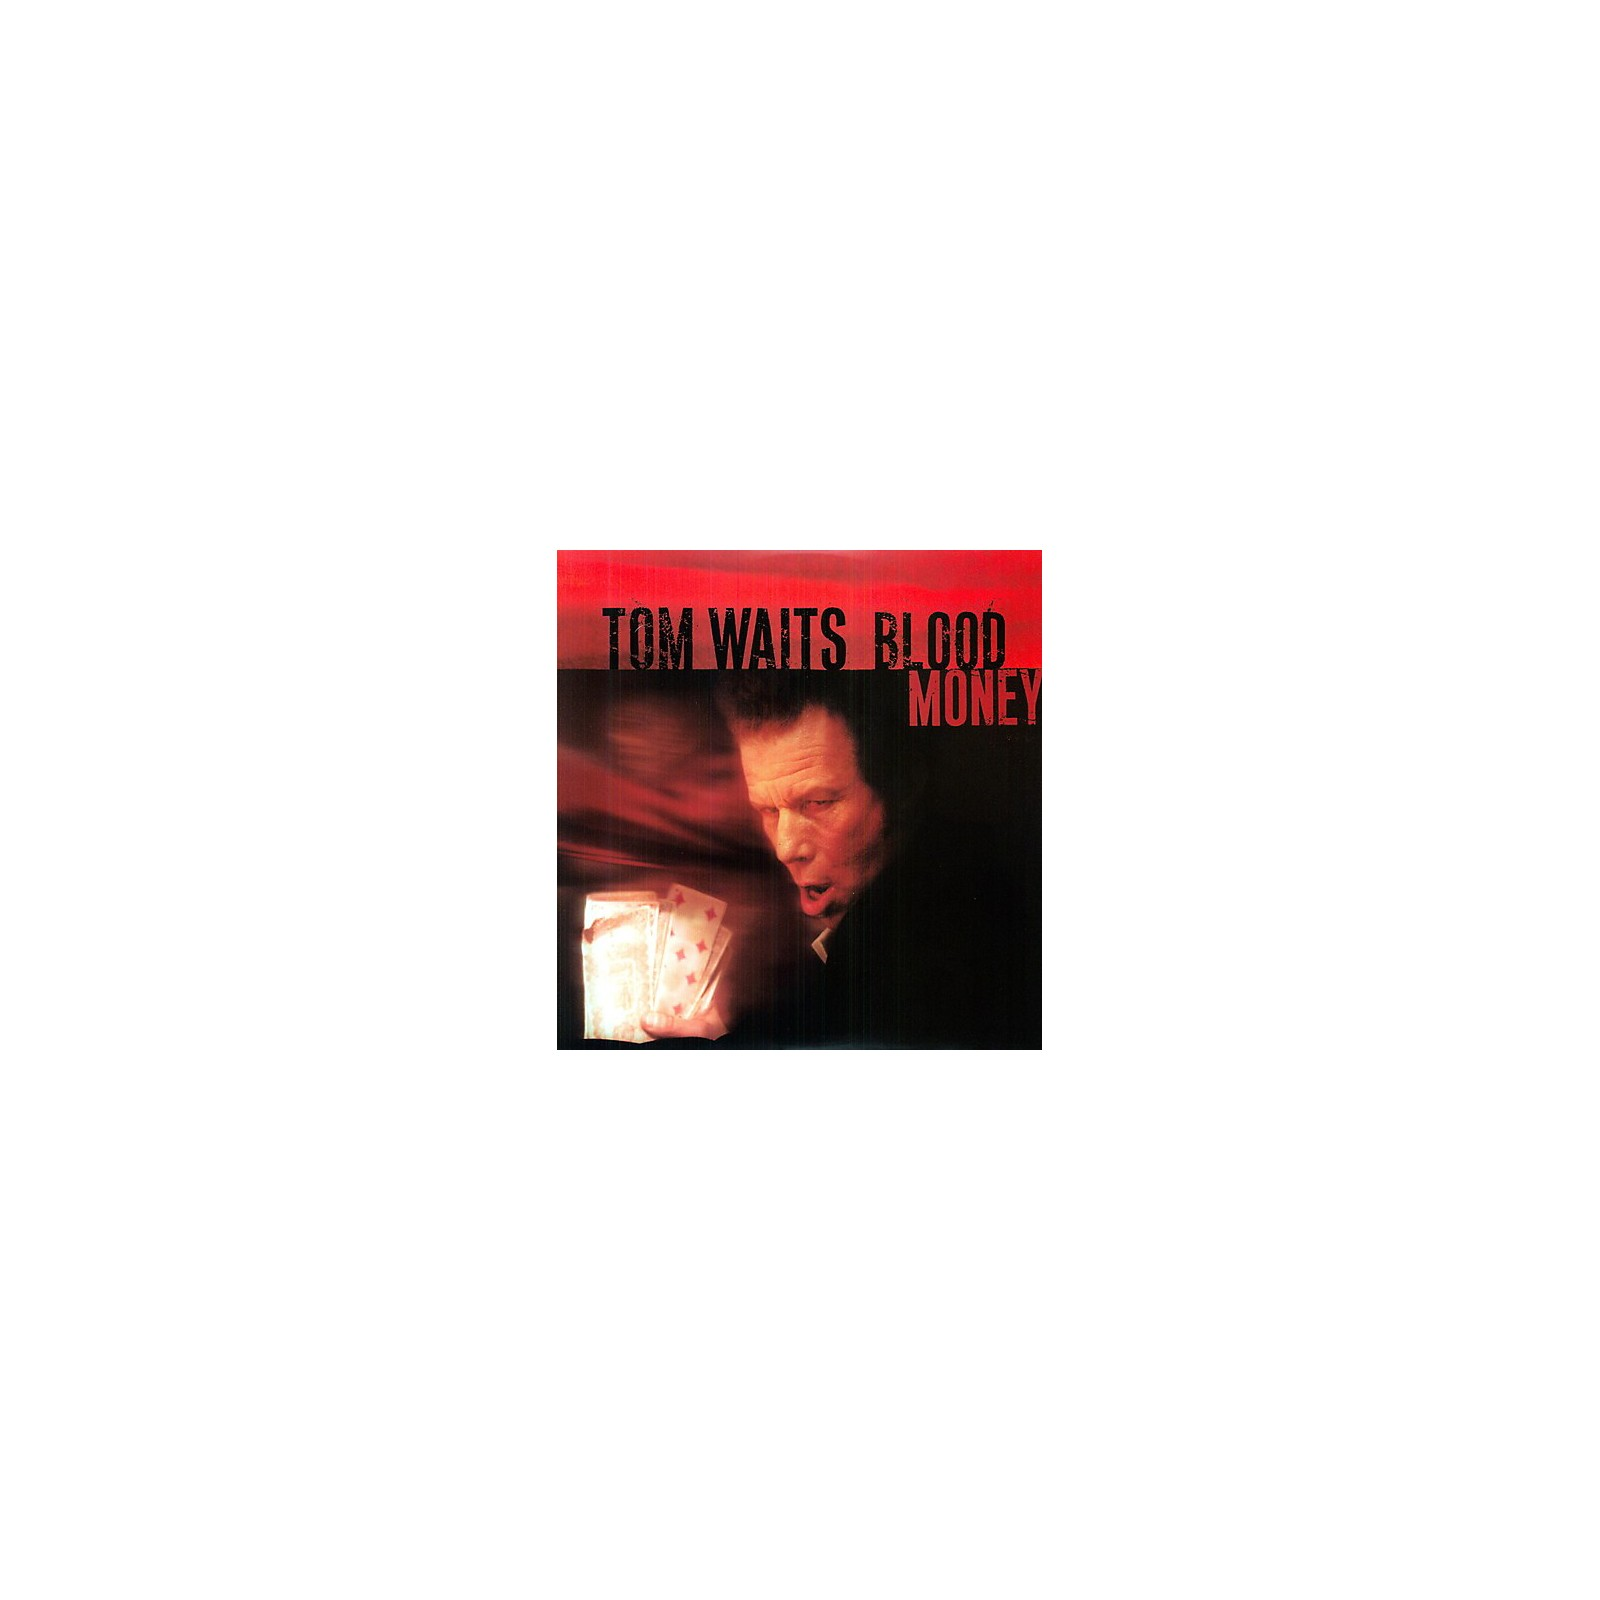 Alliance Tom Waits - Blood Money